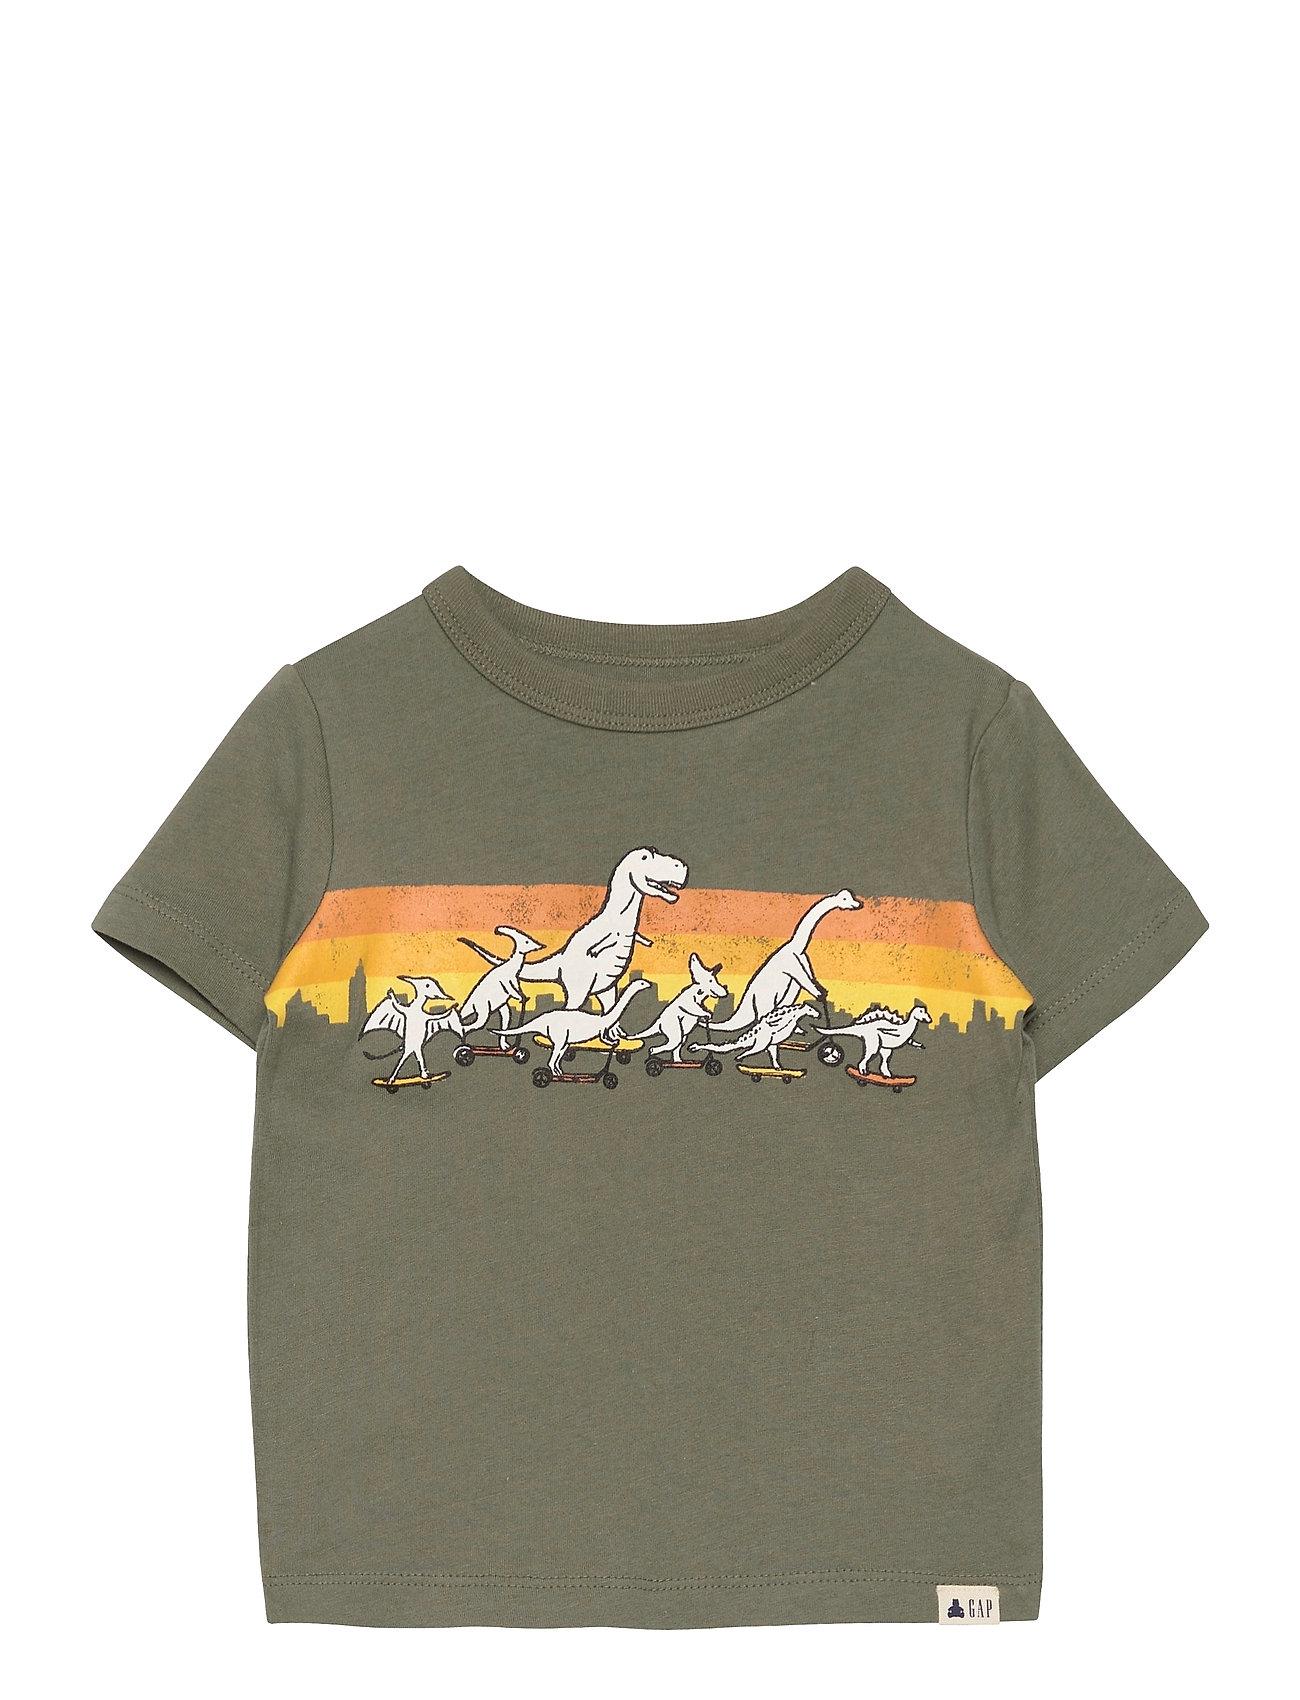 Image of Toddler 100% Organic Cotton Mix And Match Graphic T-Shirt T-shirt Grøn GAP (3505712293)